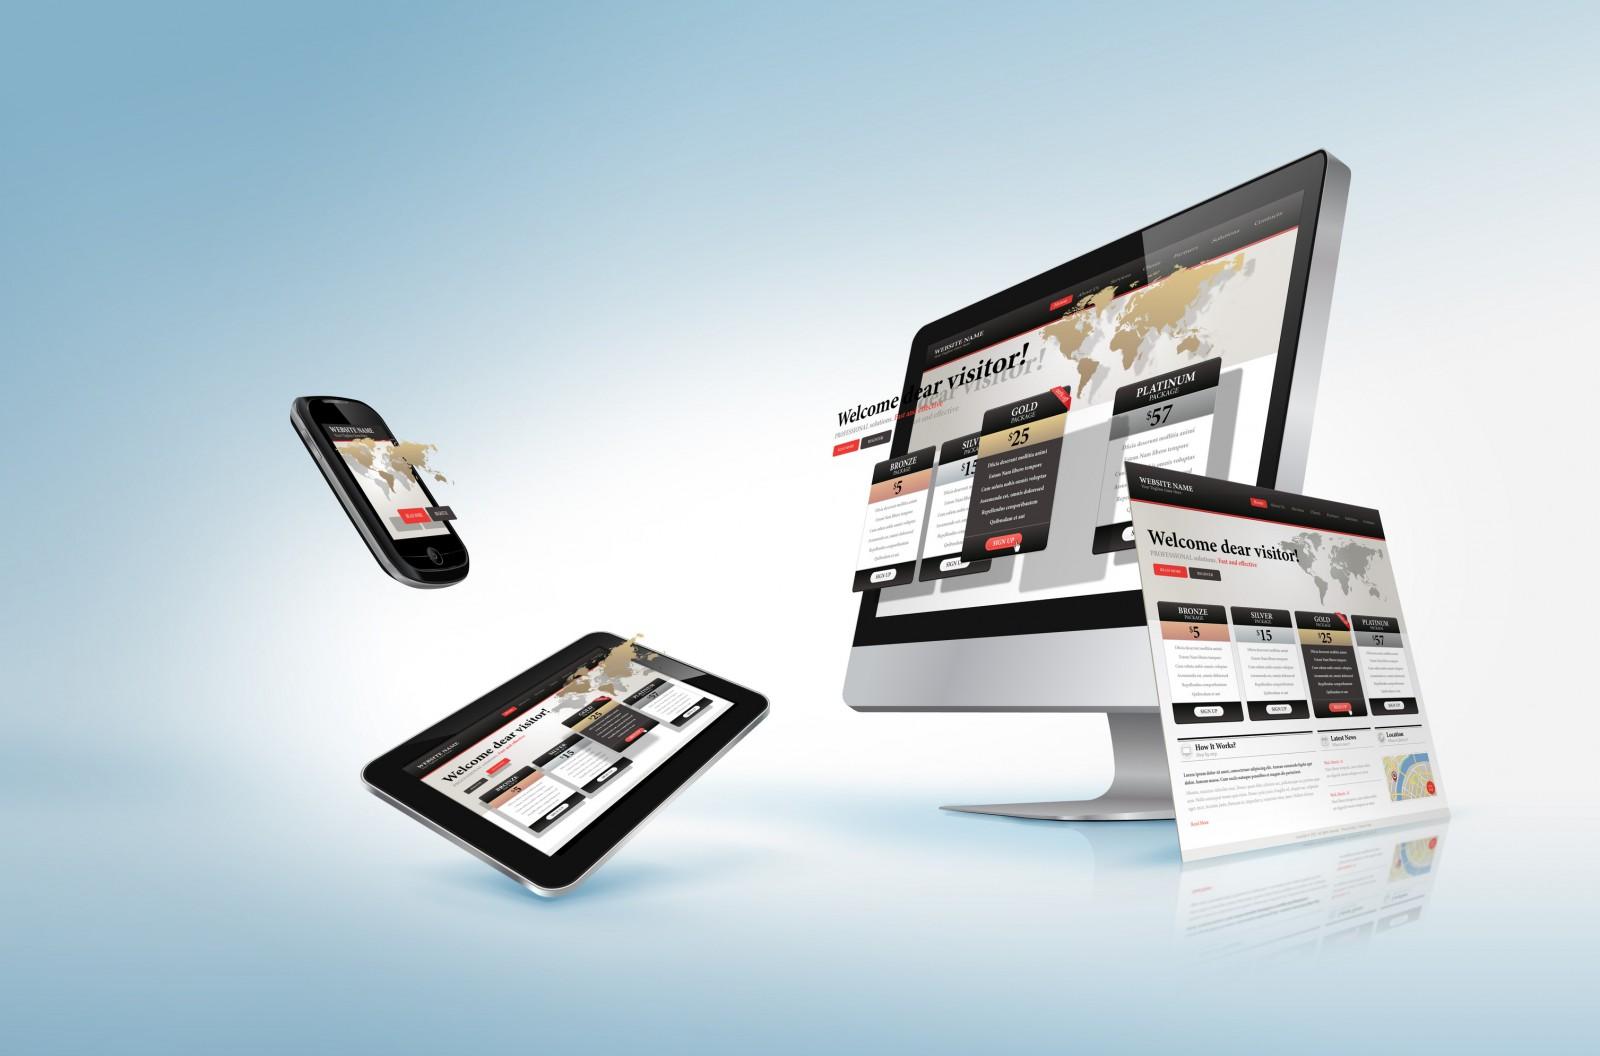 photodune-7827969-responsive-web-design-concept-l